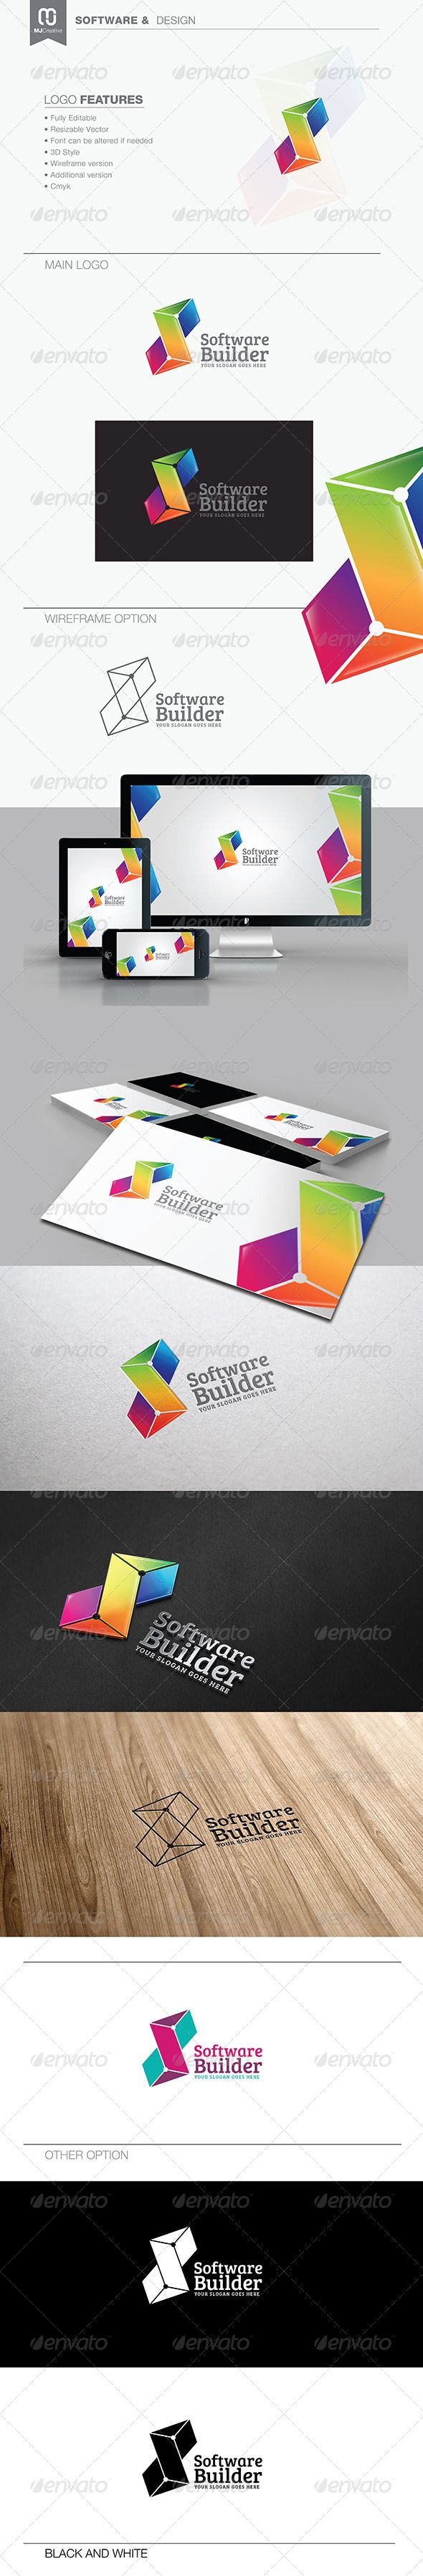 Letter+S+-+Software+&+Technology+Logo